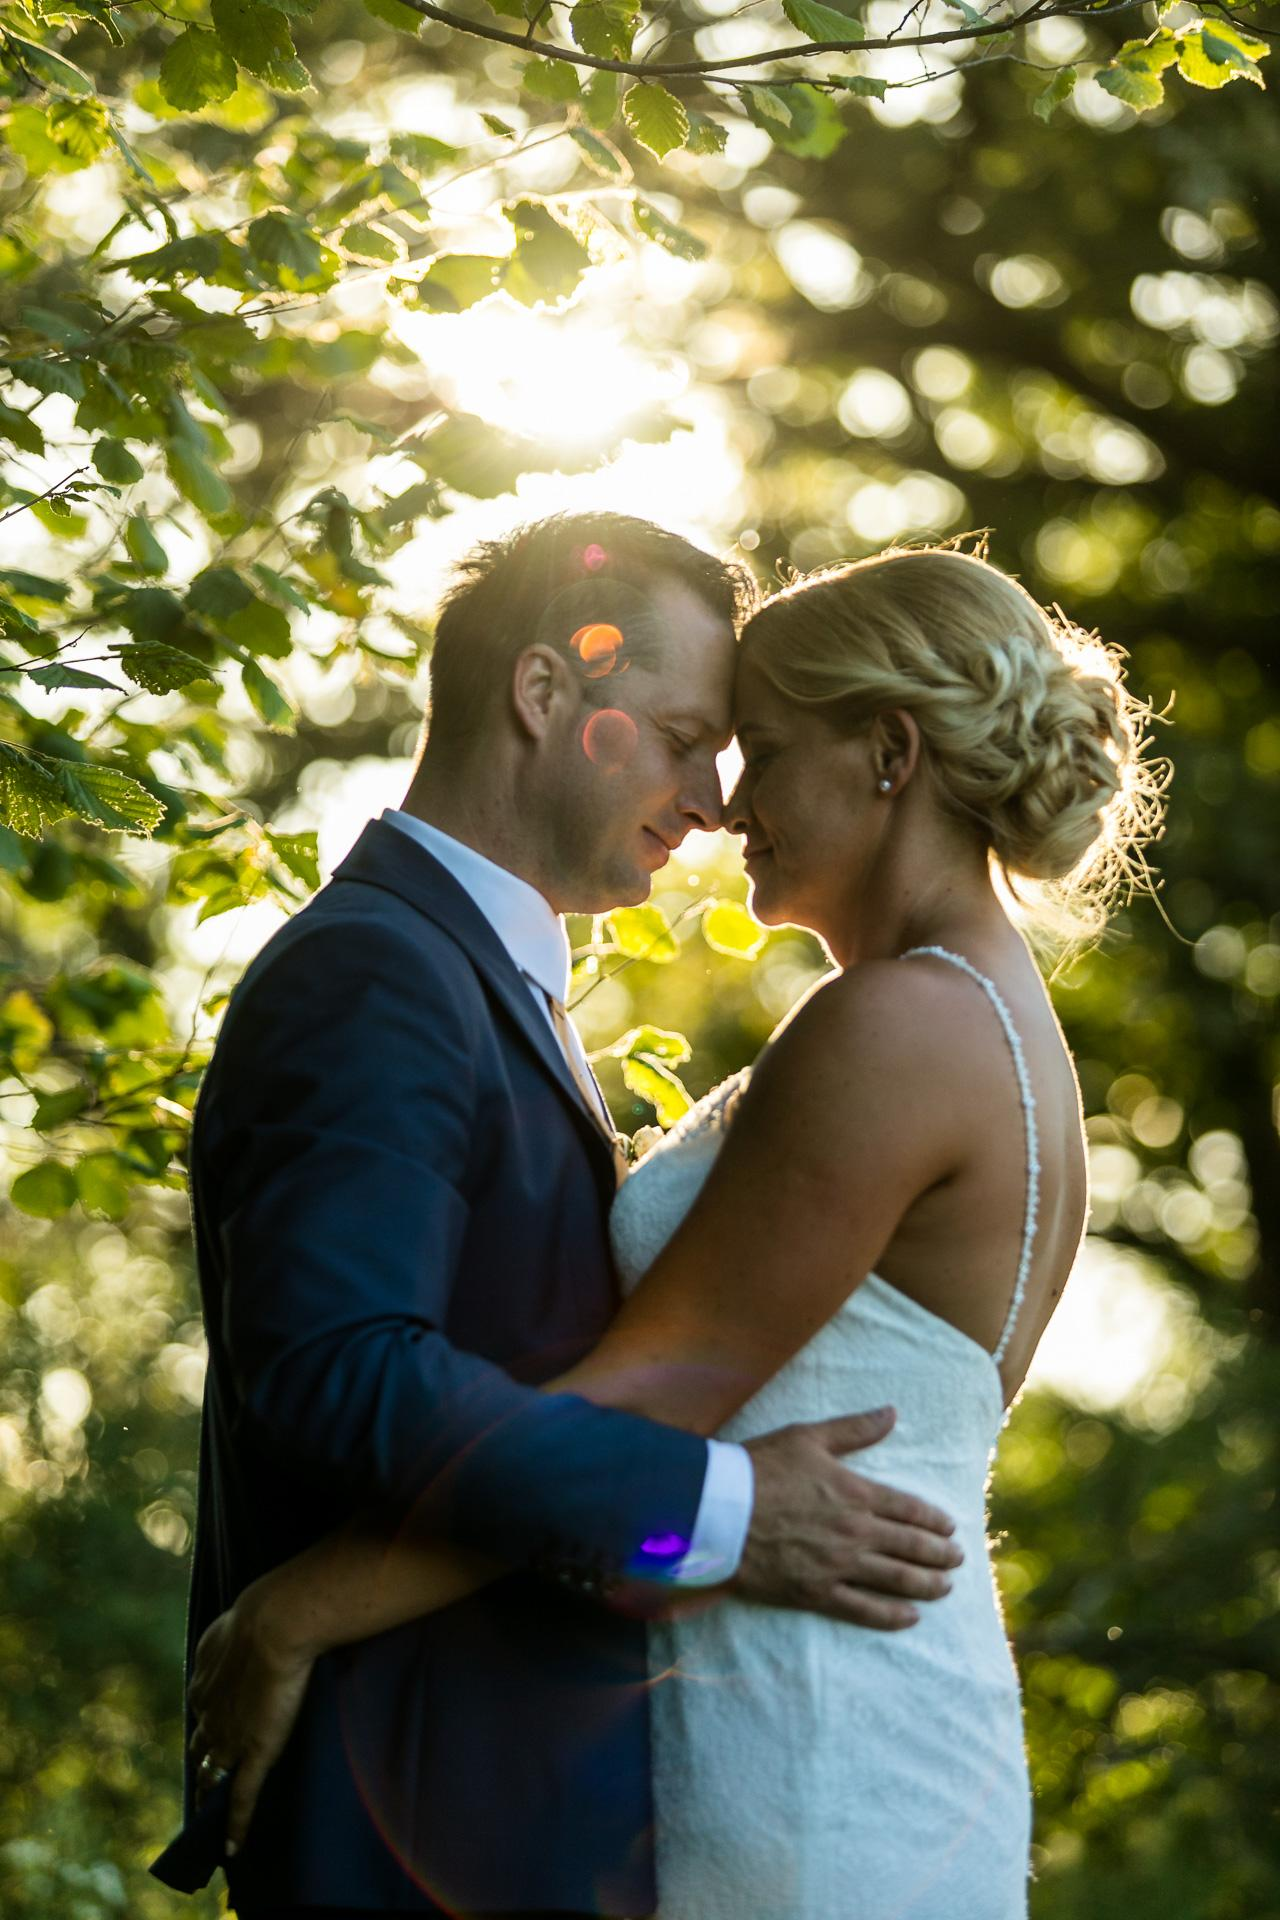 canon, canon_photos, canonglobal, fineartweddings, weddinginsp, fineartbride, weddingdream, realwedding, weddingphotomag, hochzeitinspiration, weddingideas, hairaten, vintagewedding, vintagehochzeit, bride2018, braut2019, wedding2019, hochzeit2018, hochzeit_gluck,